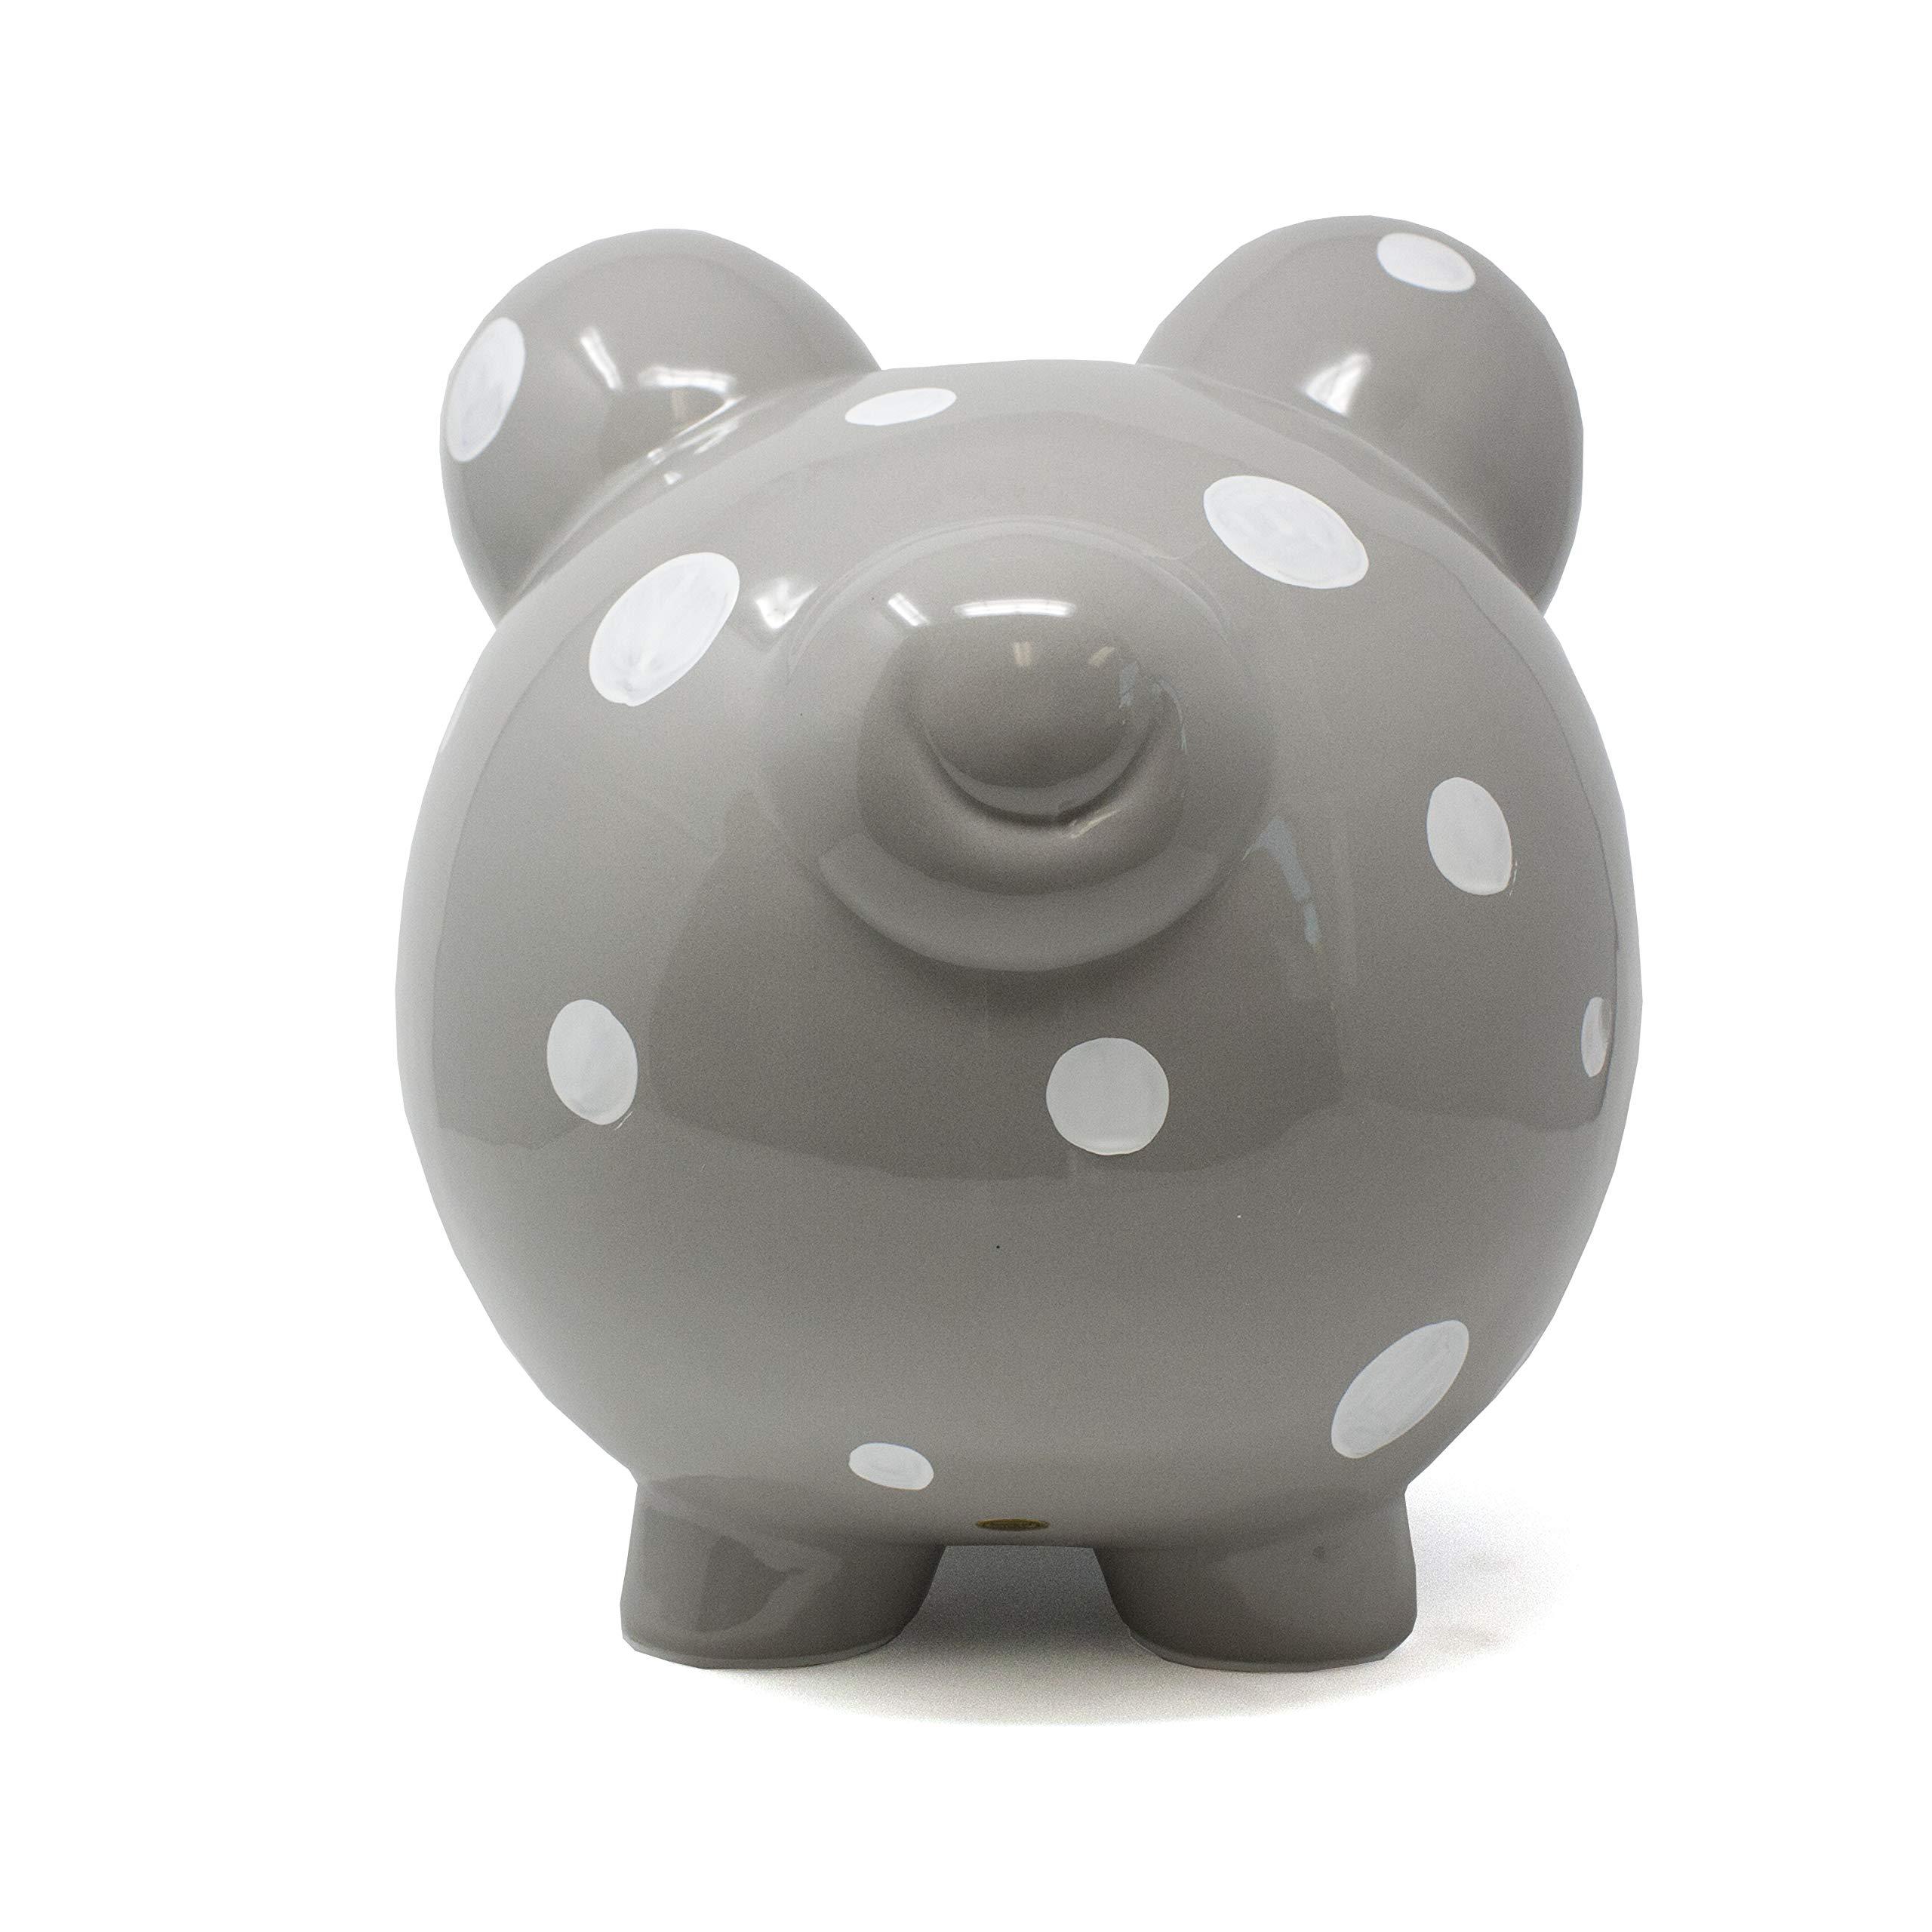 Child to Cherish Large Ceramic Boss Piggy Bank, Gray Polka Dot by Child to Cherish (Image #3)